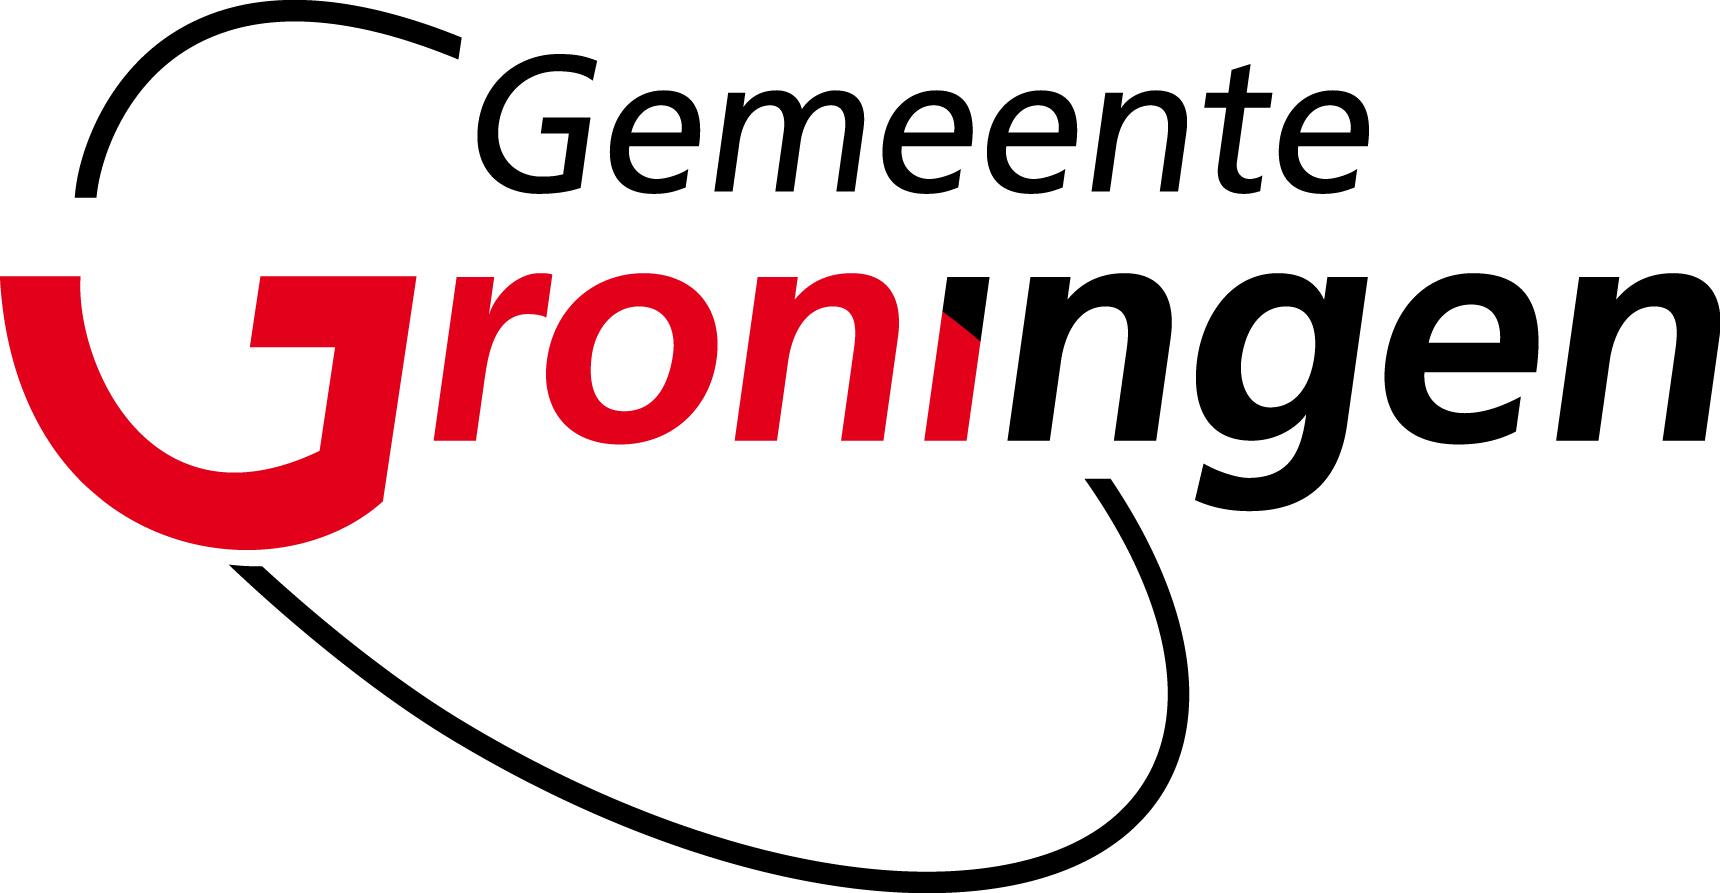 Logo-Gemeente-Groningen-1.jpg